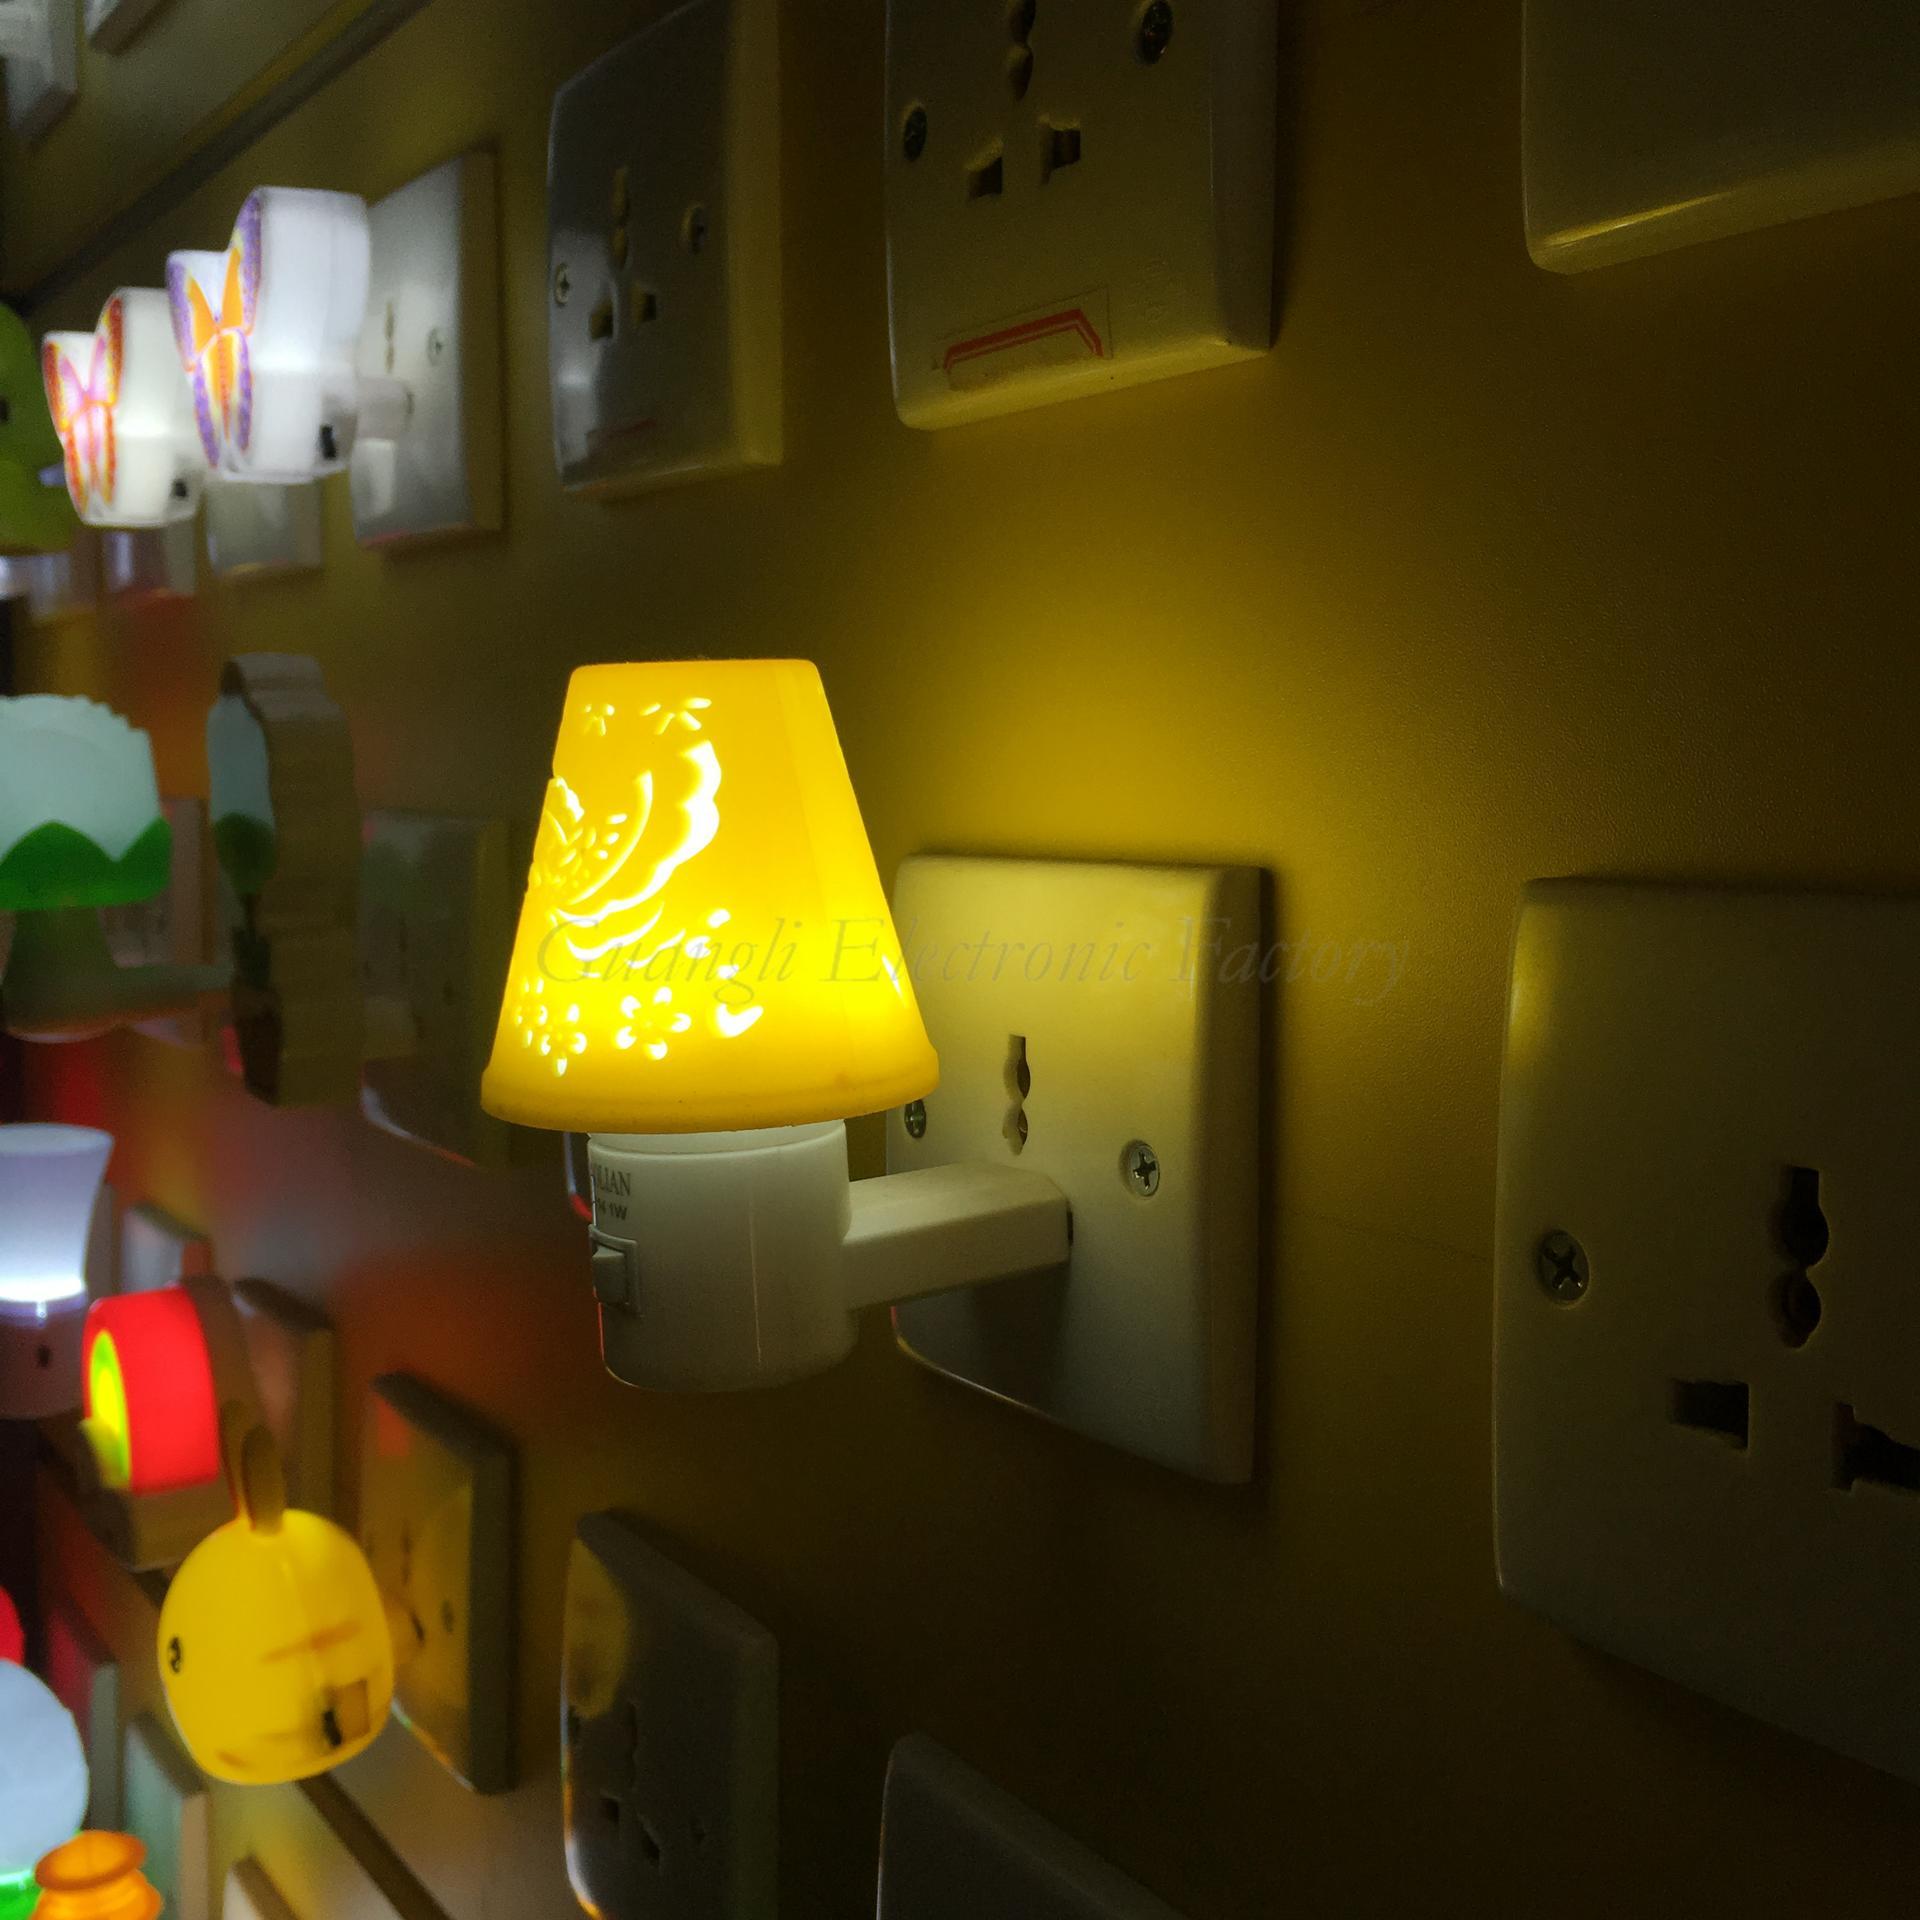 OEM butterfly Carved design shape 4 SMD mini switch Sensor plug in night light with 0.6W AC 110V or 220V W055